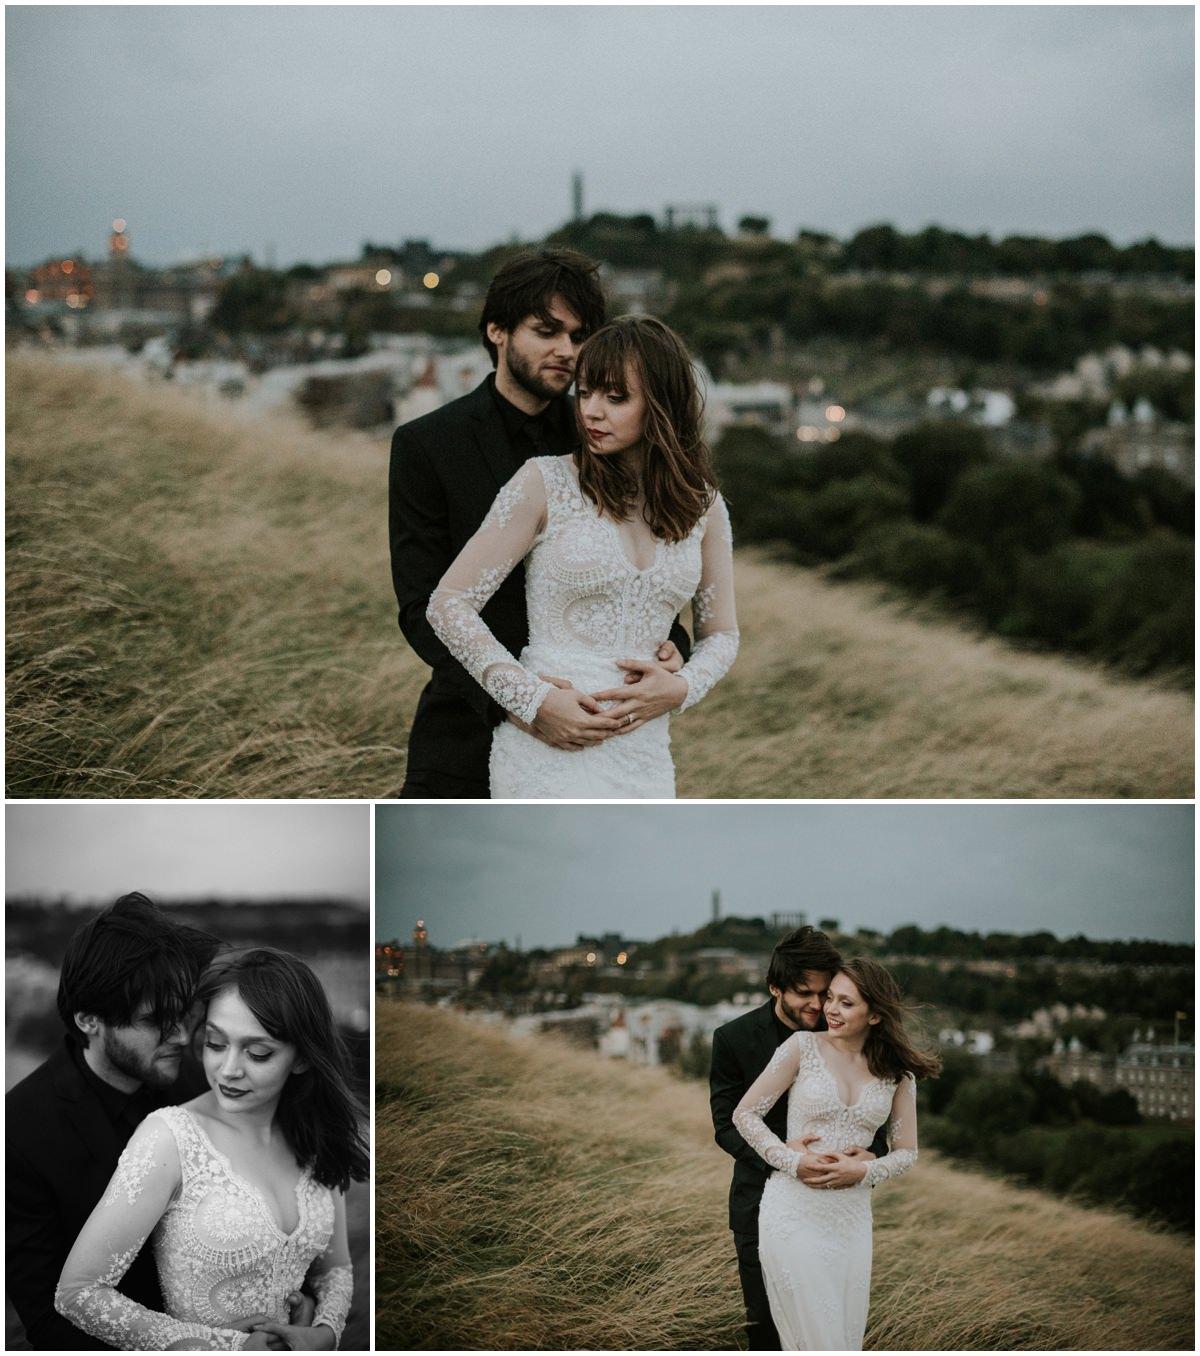 Unique Wedding Dresses Scotland: Post-wedding Photography Session In Edinburgh, Scotland